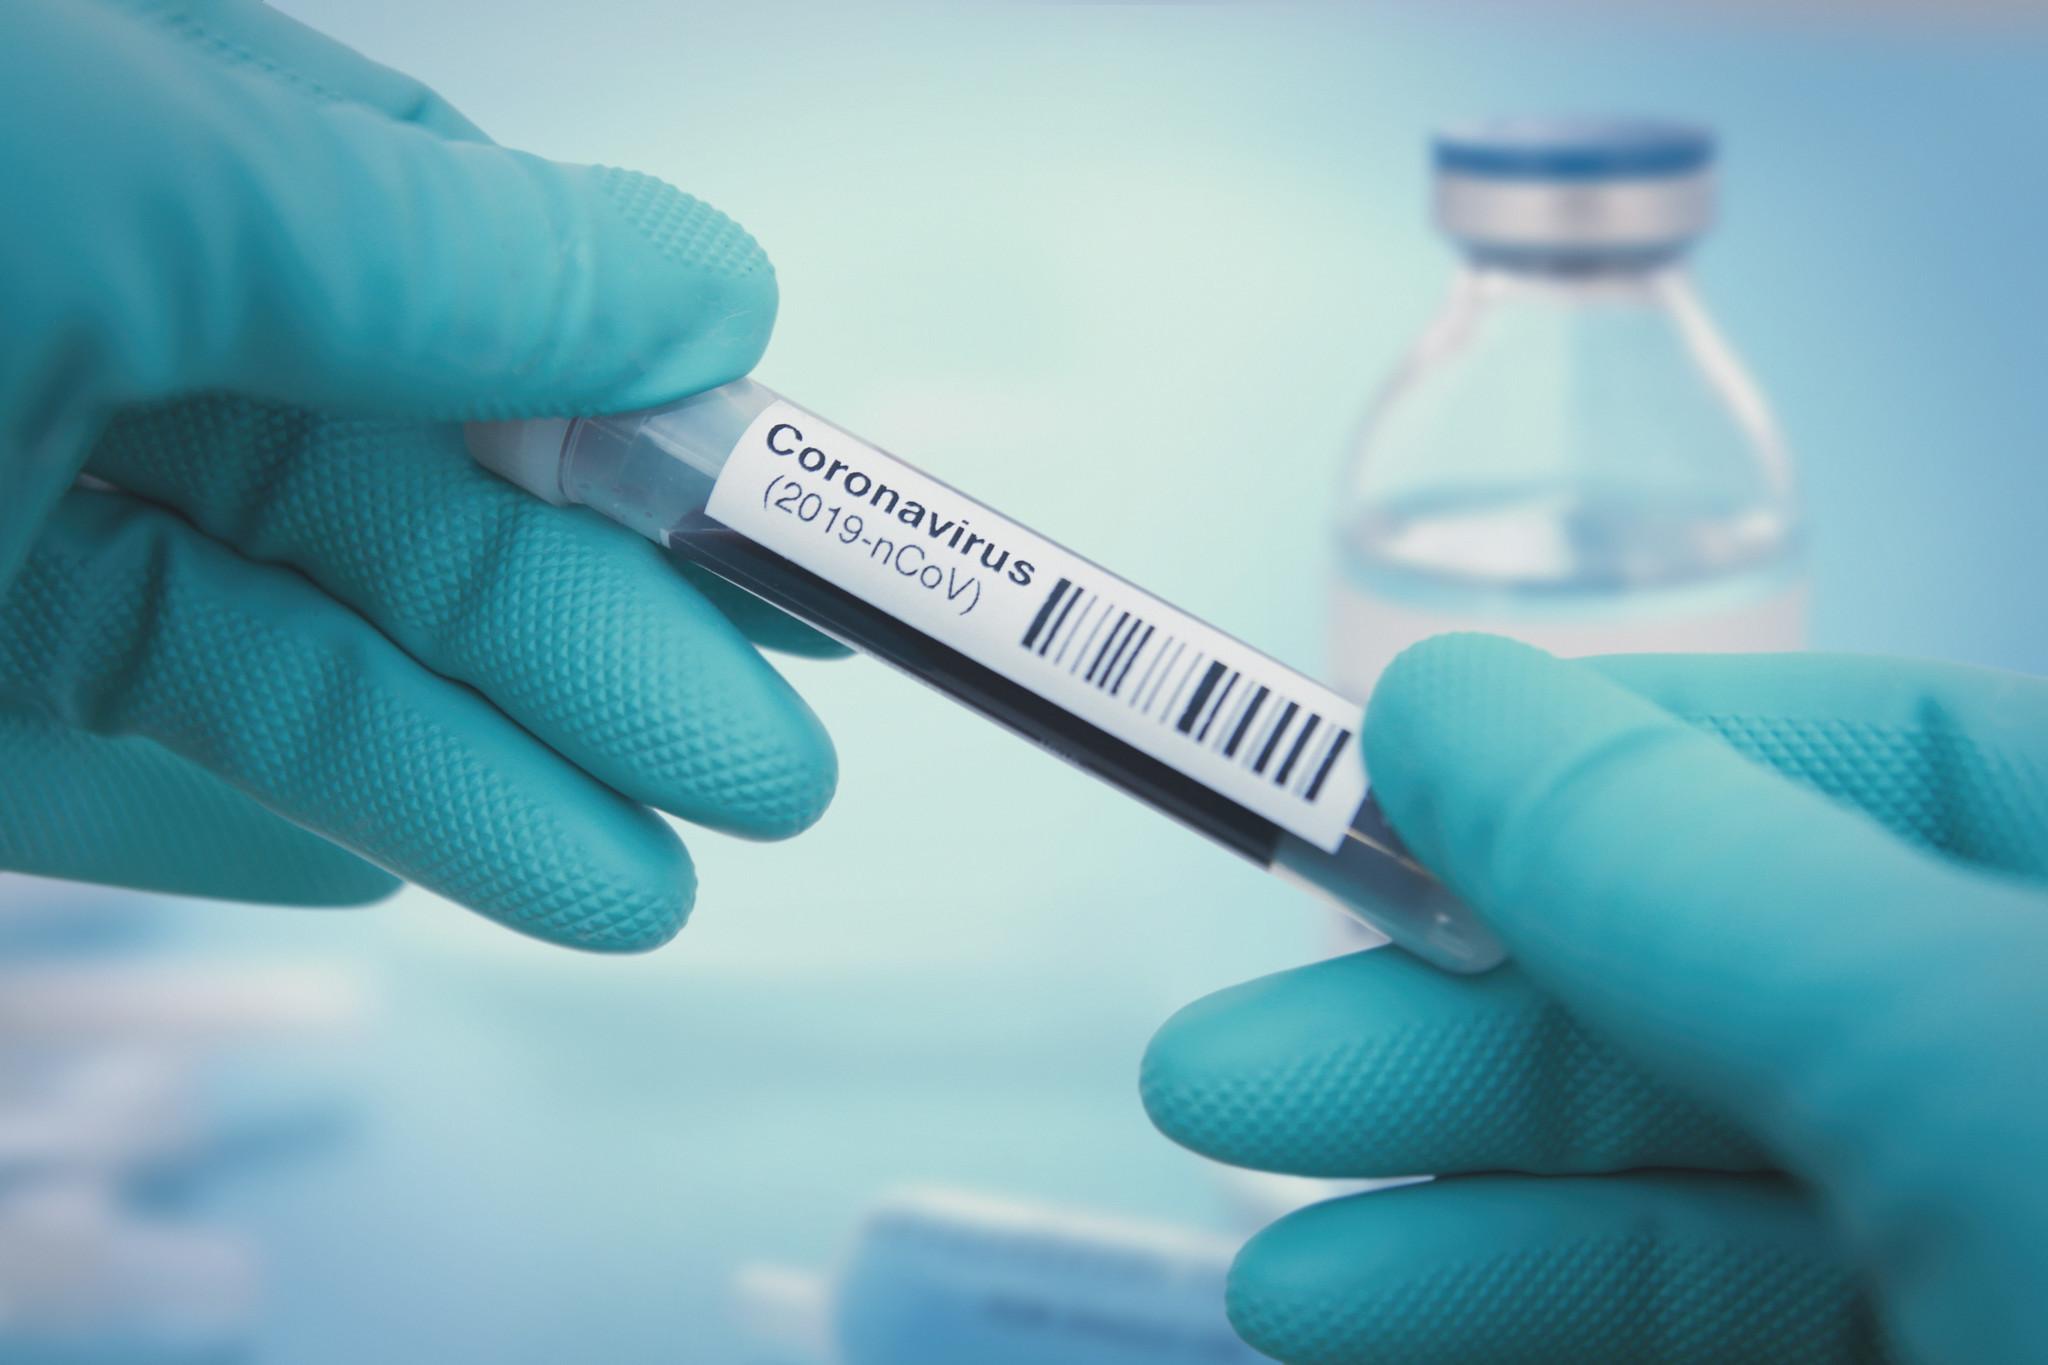 NYC nurse dies as medical staff overwhelmed with coronavirus cases